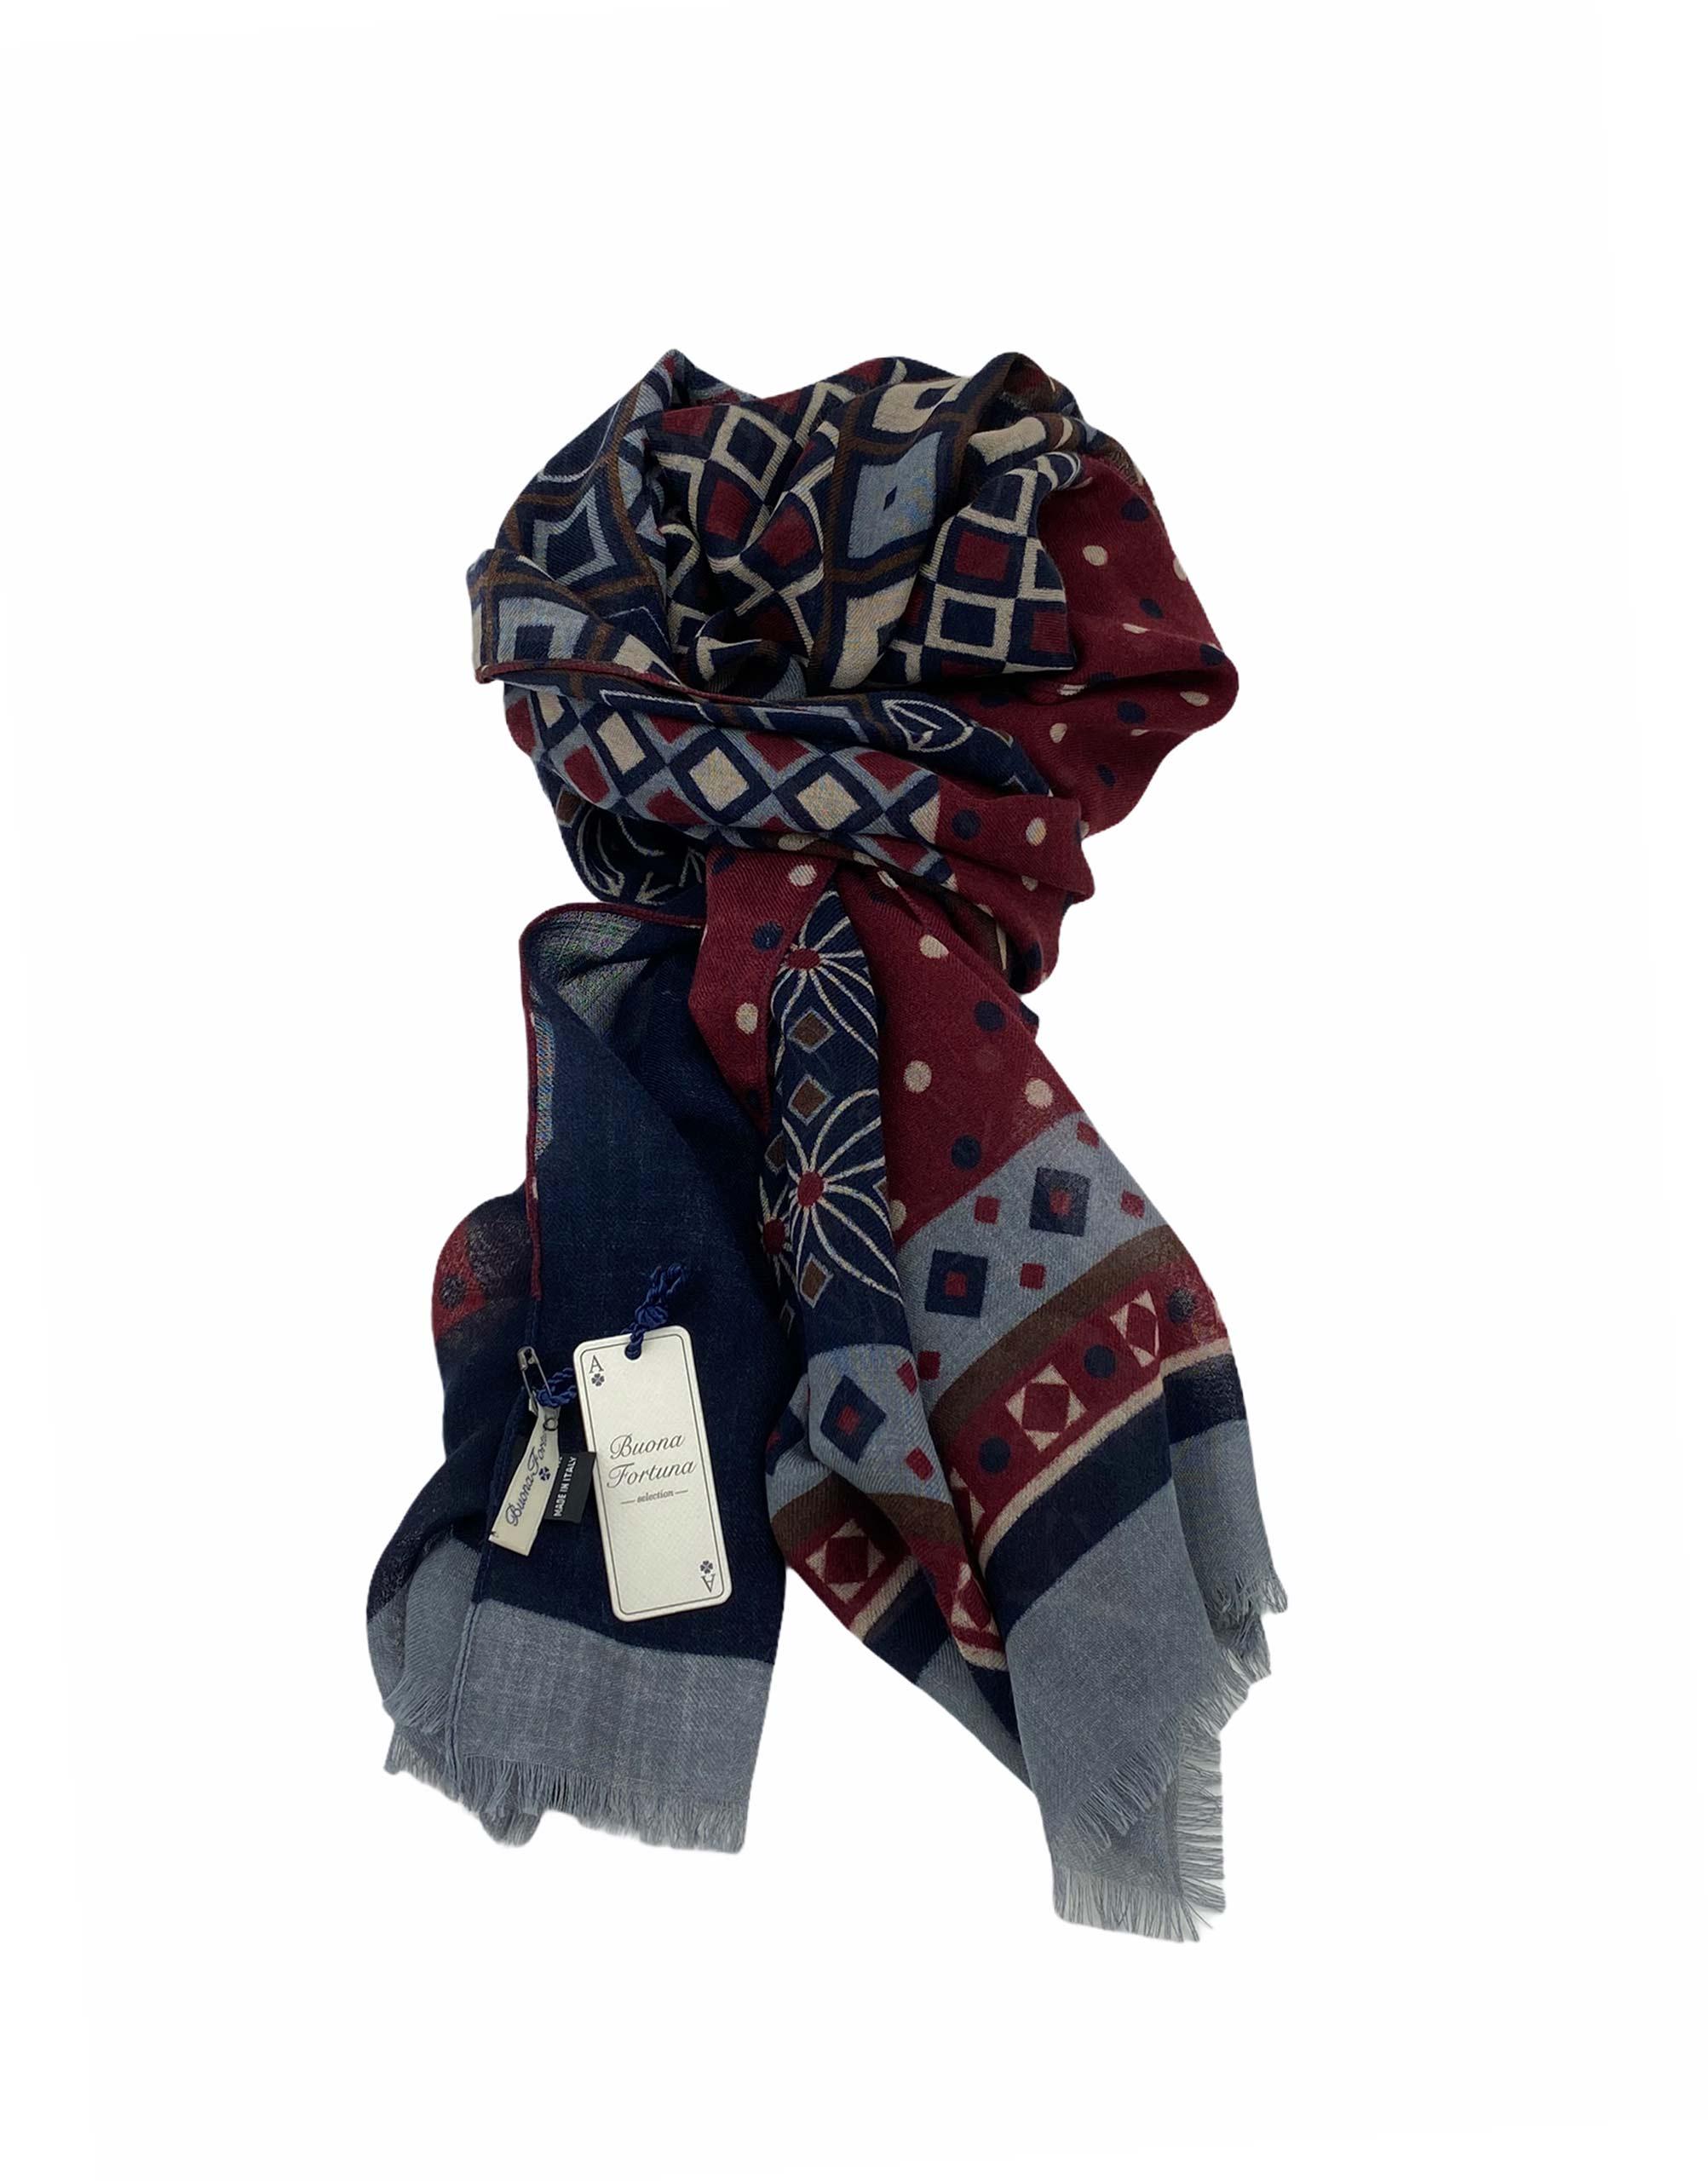 pashmina buona fortuna exclusivas comprar online moda italiana foulards shop geometrica granate beiges